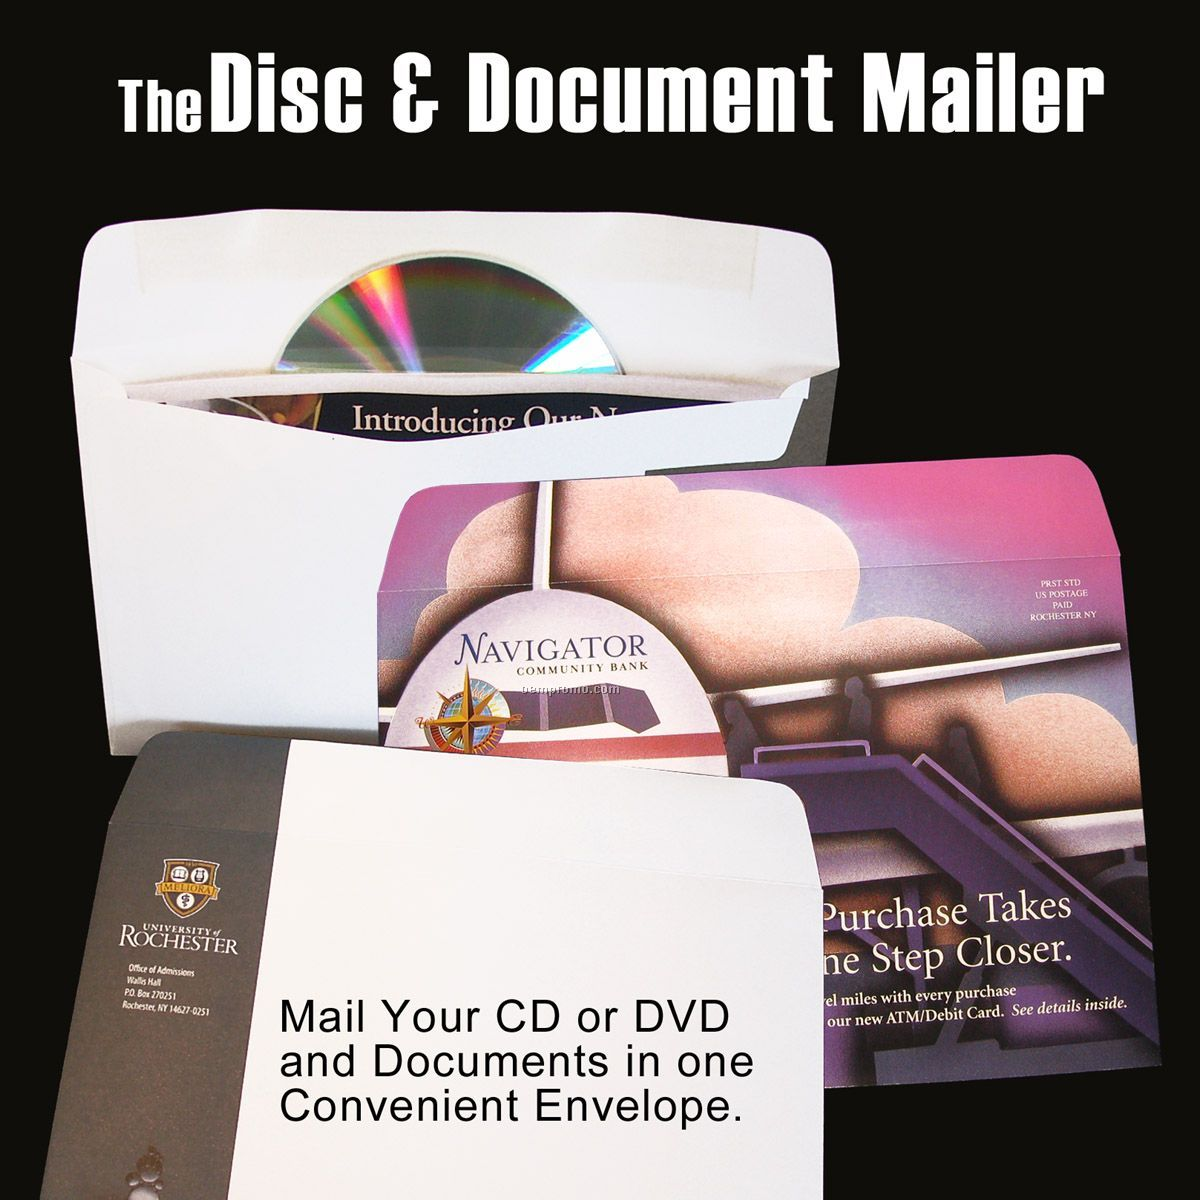 Disc & Document Mailer - 1 Color Disc & Document Mailer